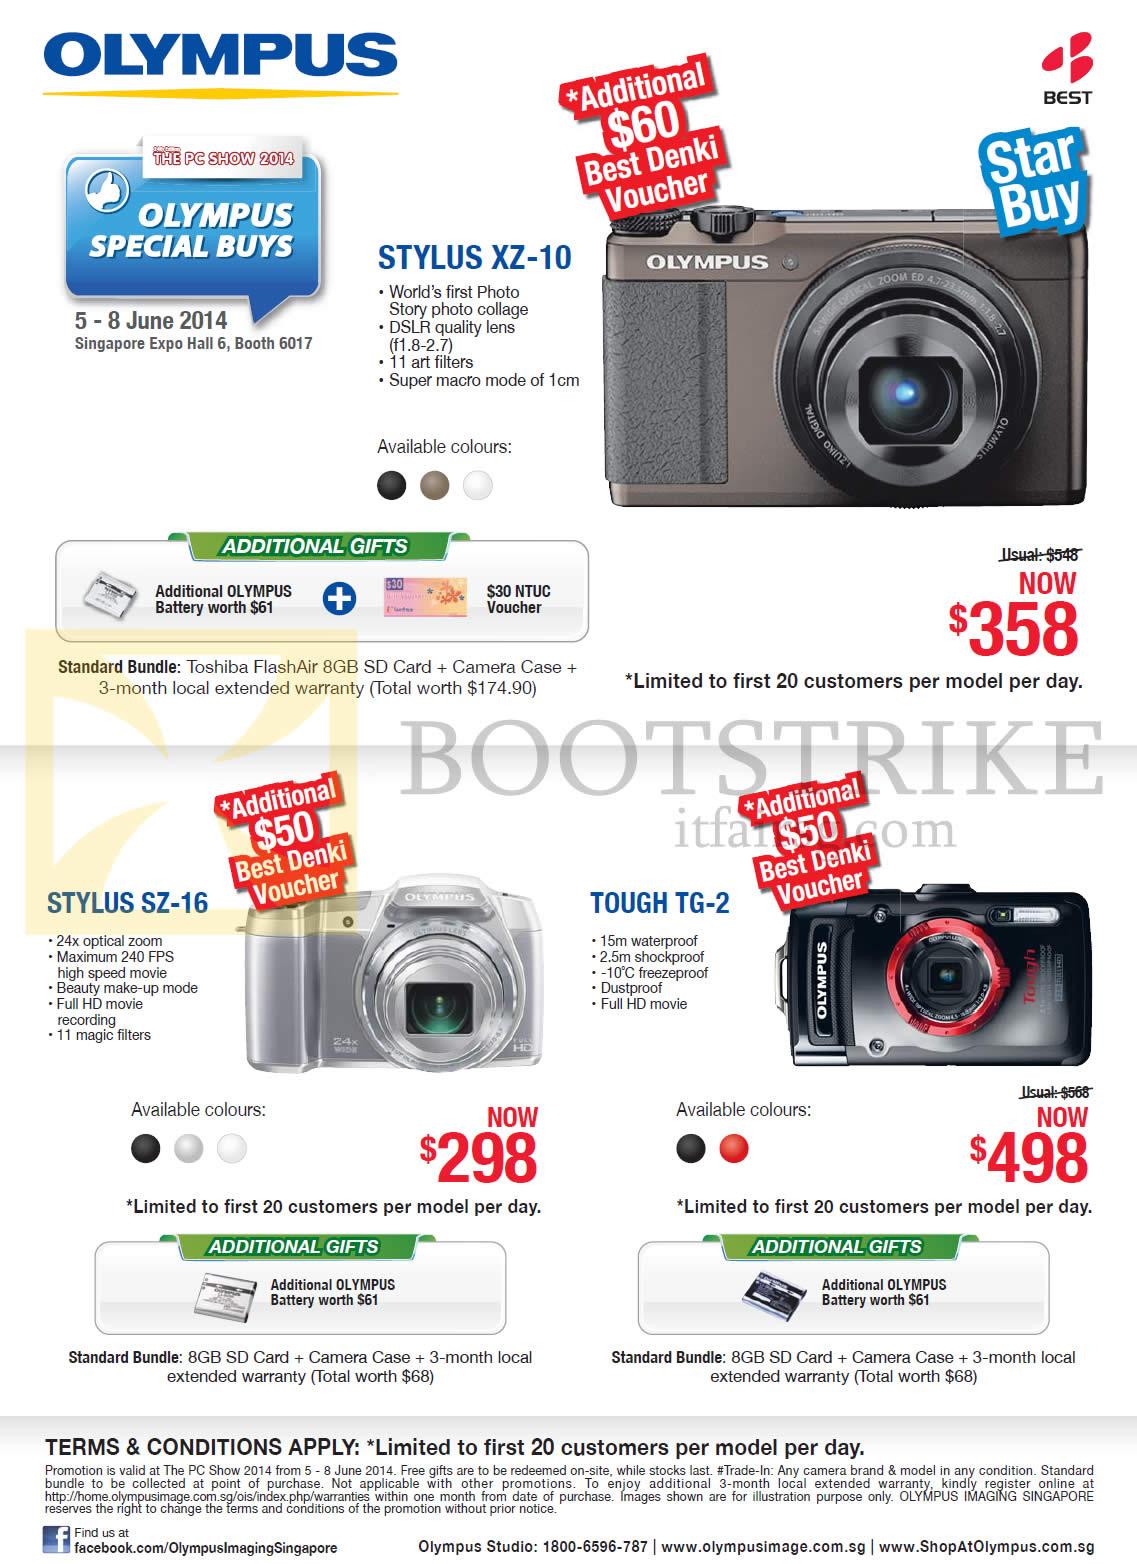 PC SHOW 2014 price list image brochure of Olympus Digital Cameras Stylus XZ-10, SZ-16, Tough TG-2